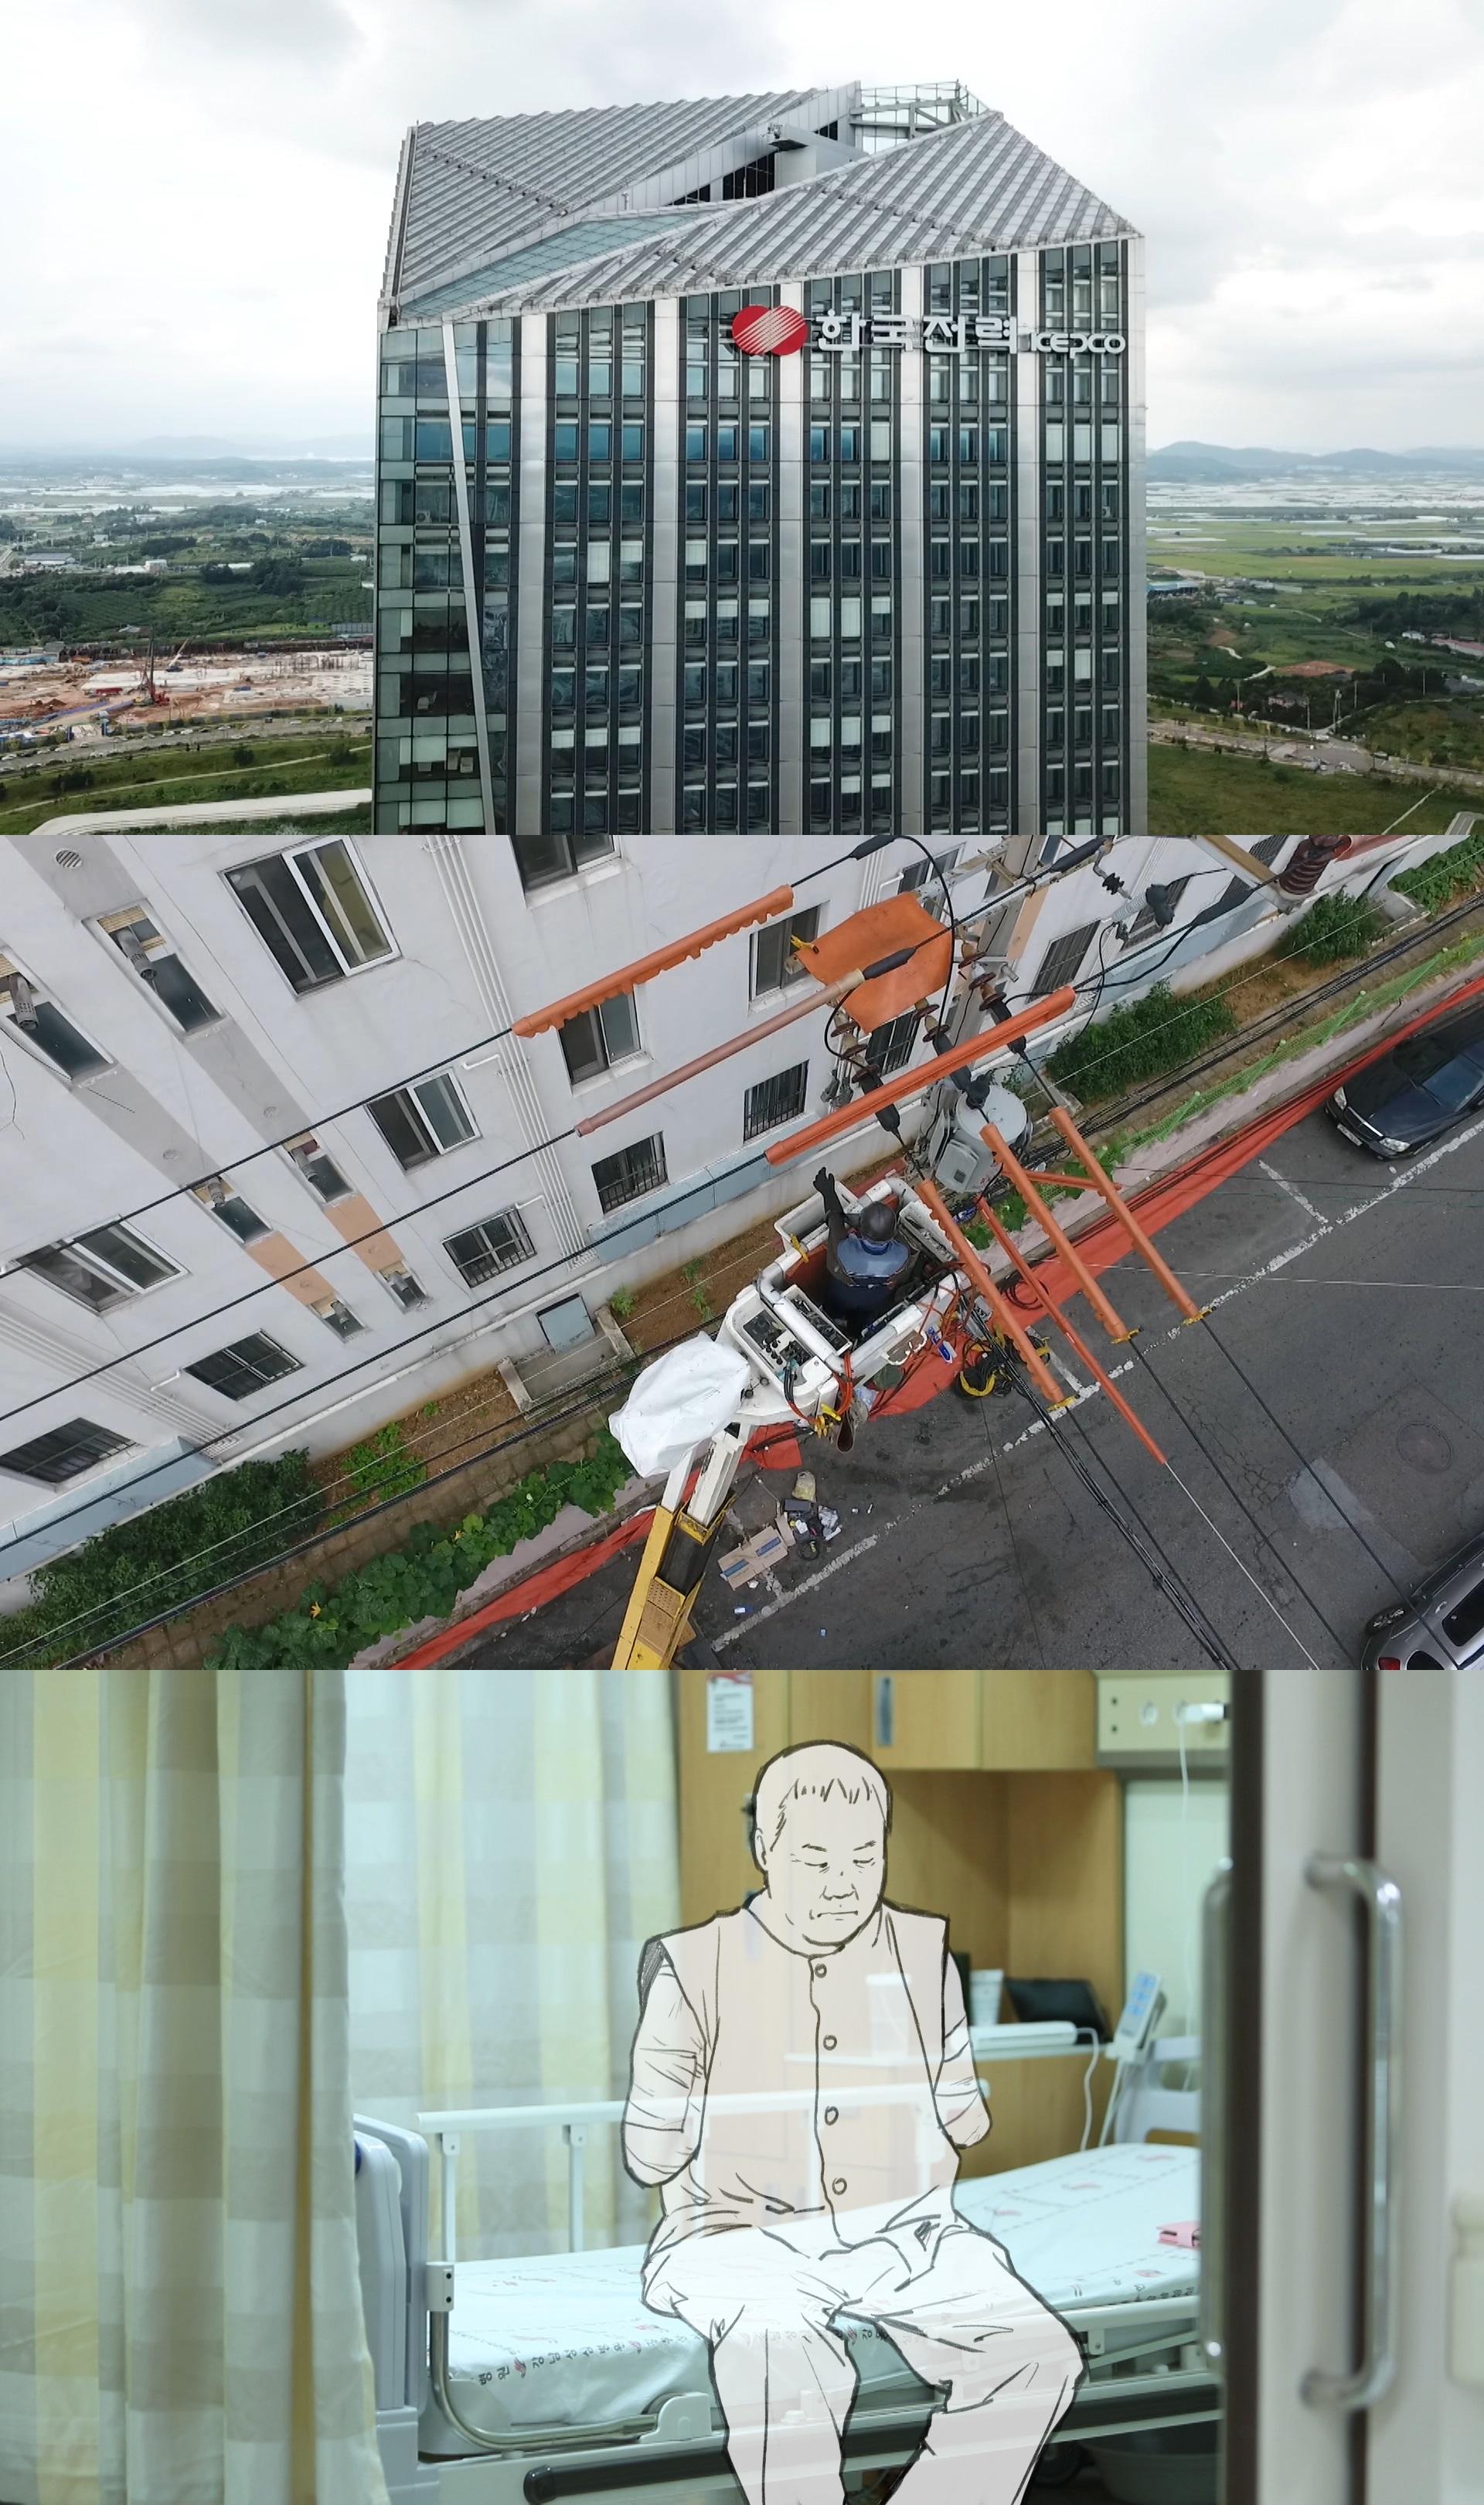 'PD수첩', 아슬아슬 위험한 한국전력 하청 노동자들의 현실...11일 '한국전력의 일회용 인간들' 방송